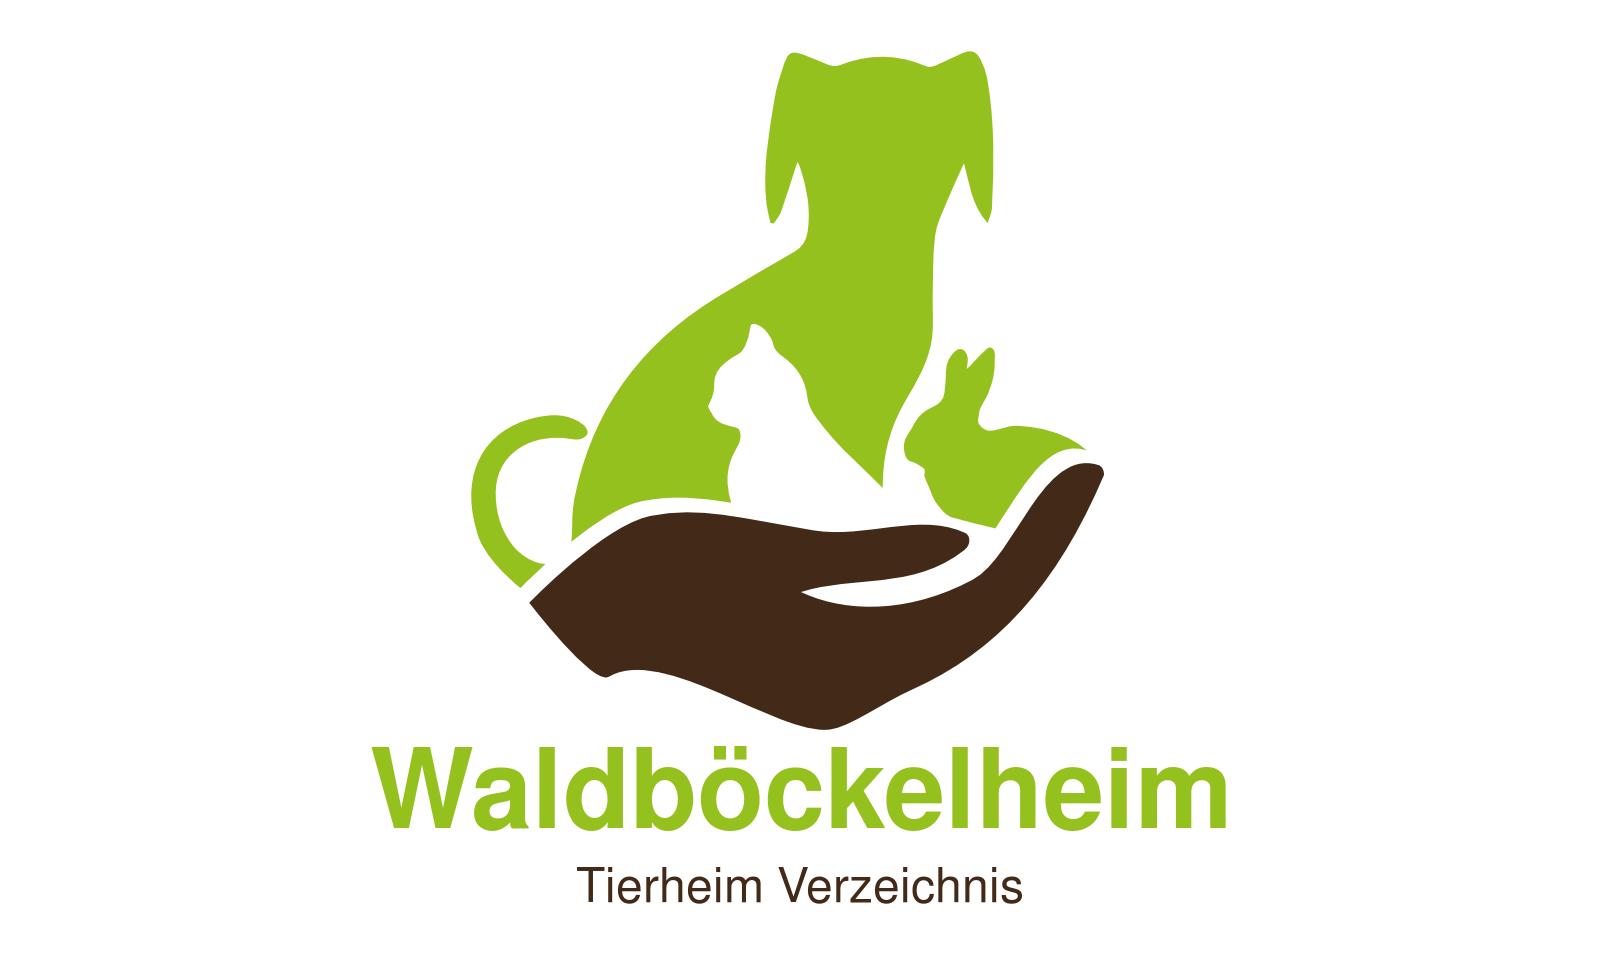 Tierheim Waldböckelheim